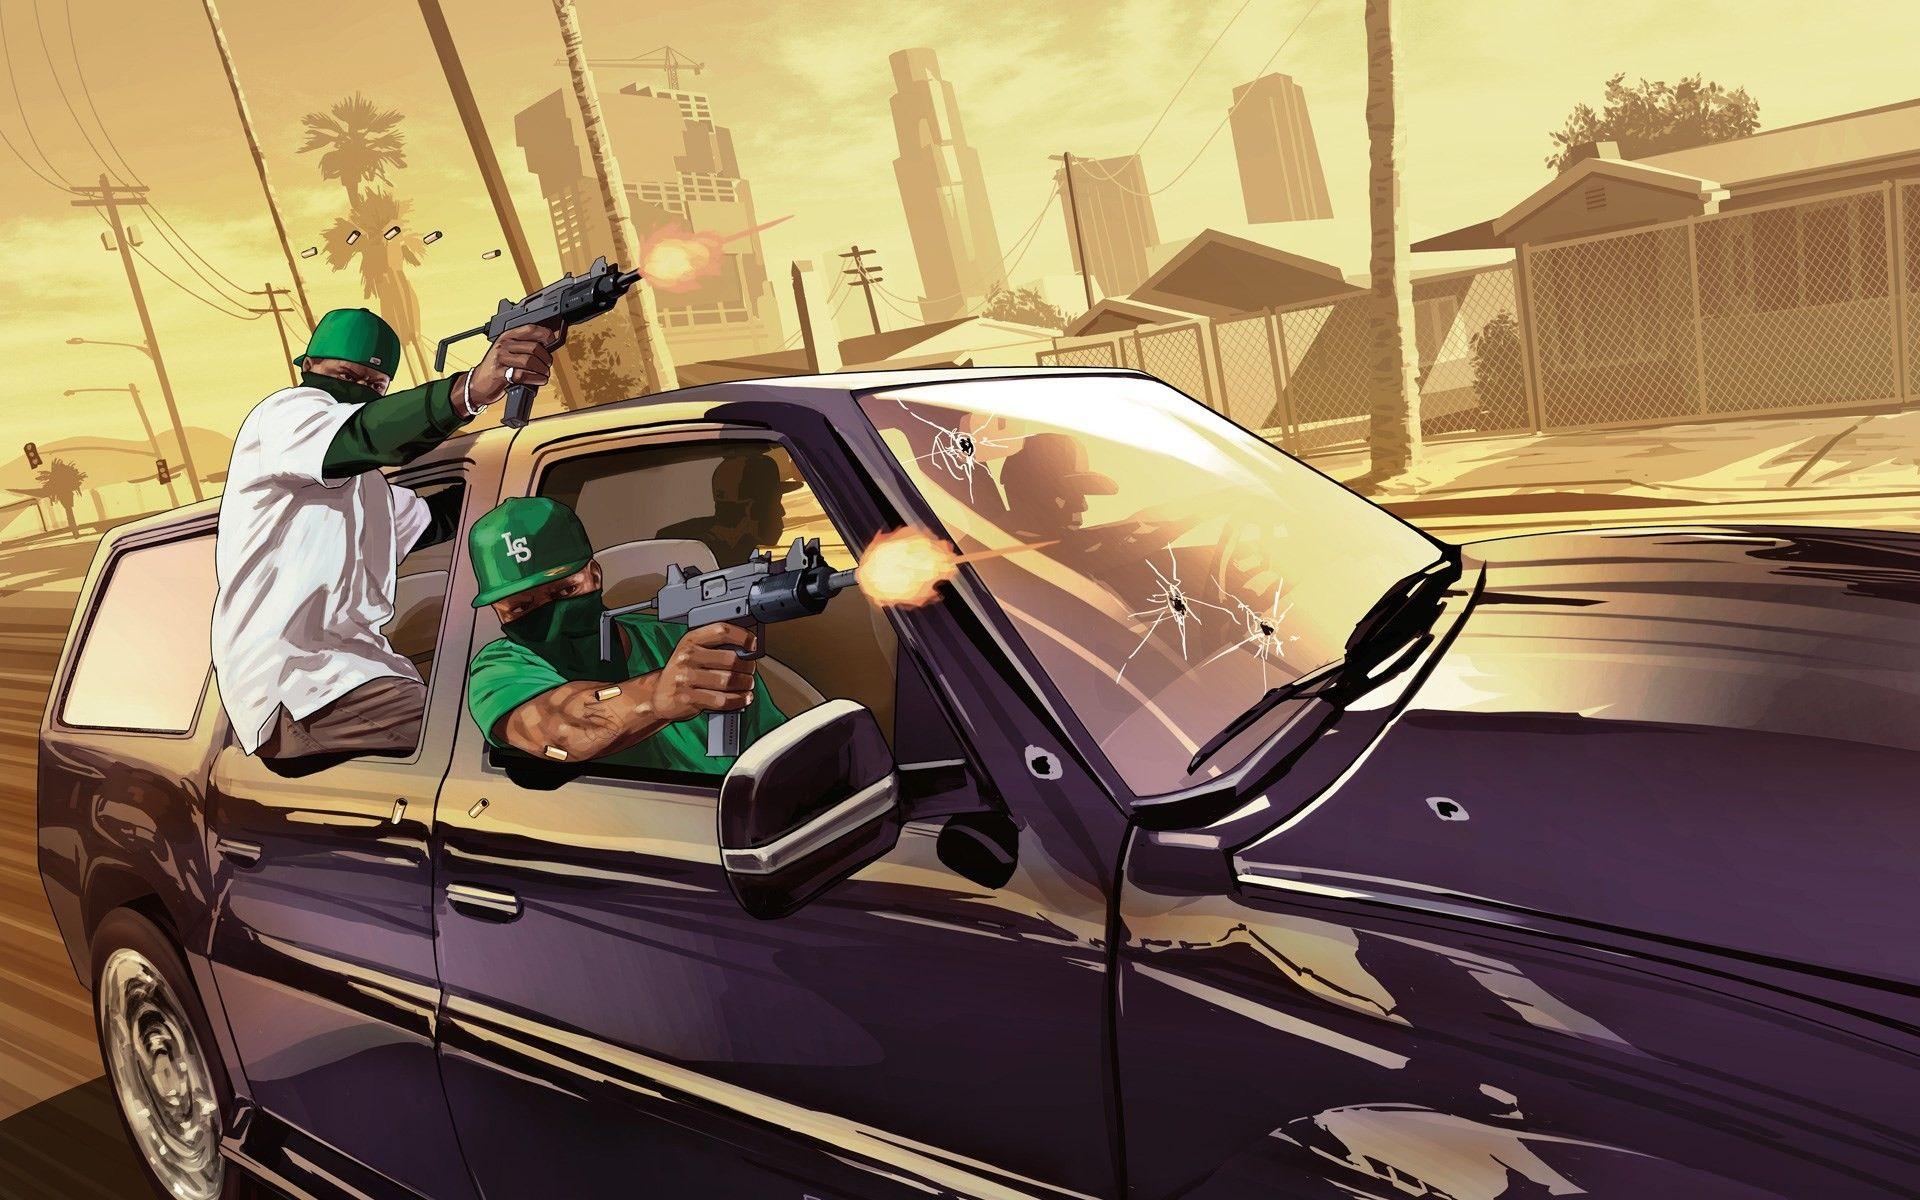 1920x1200 Grand Theft Auto V Wallpaper Backgrounds Hd 1920x1200